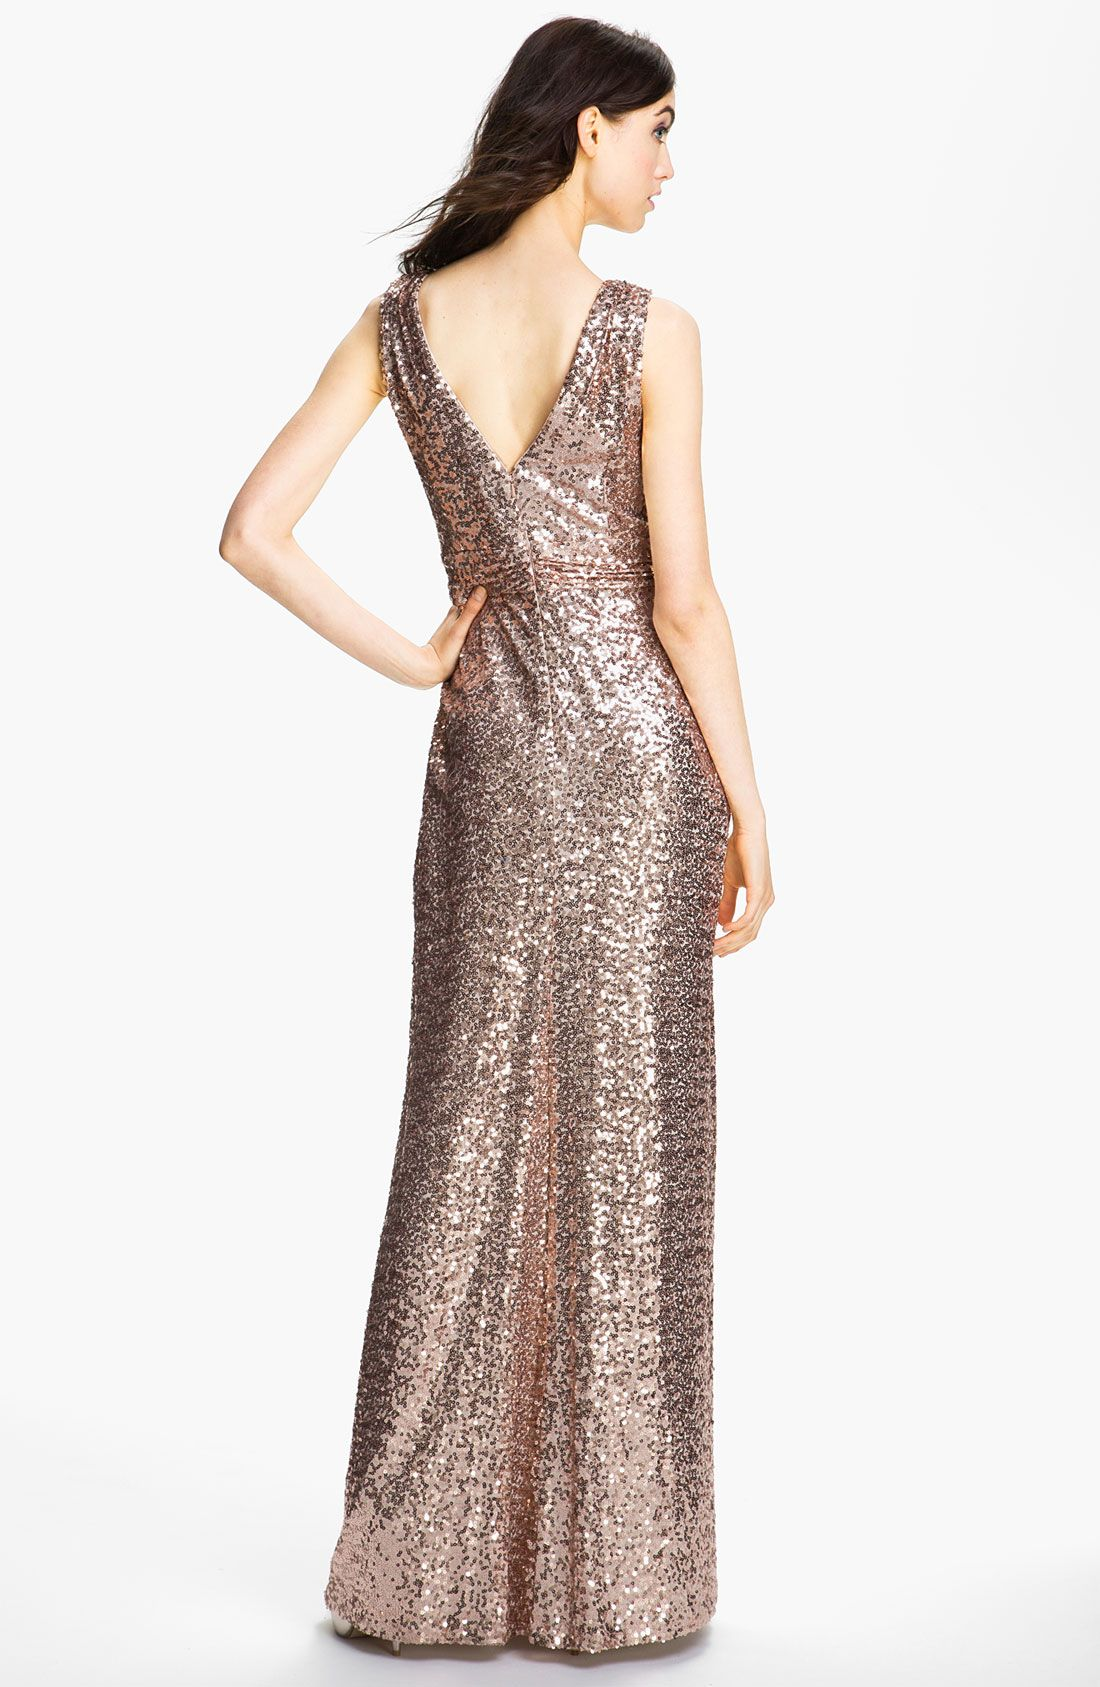 Badgley Mischka Double Vneck Sequin Gown in Gold (blush